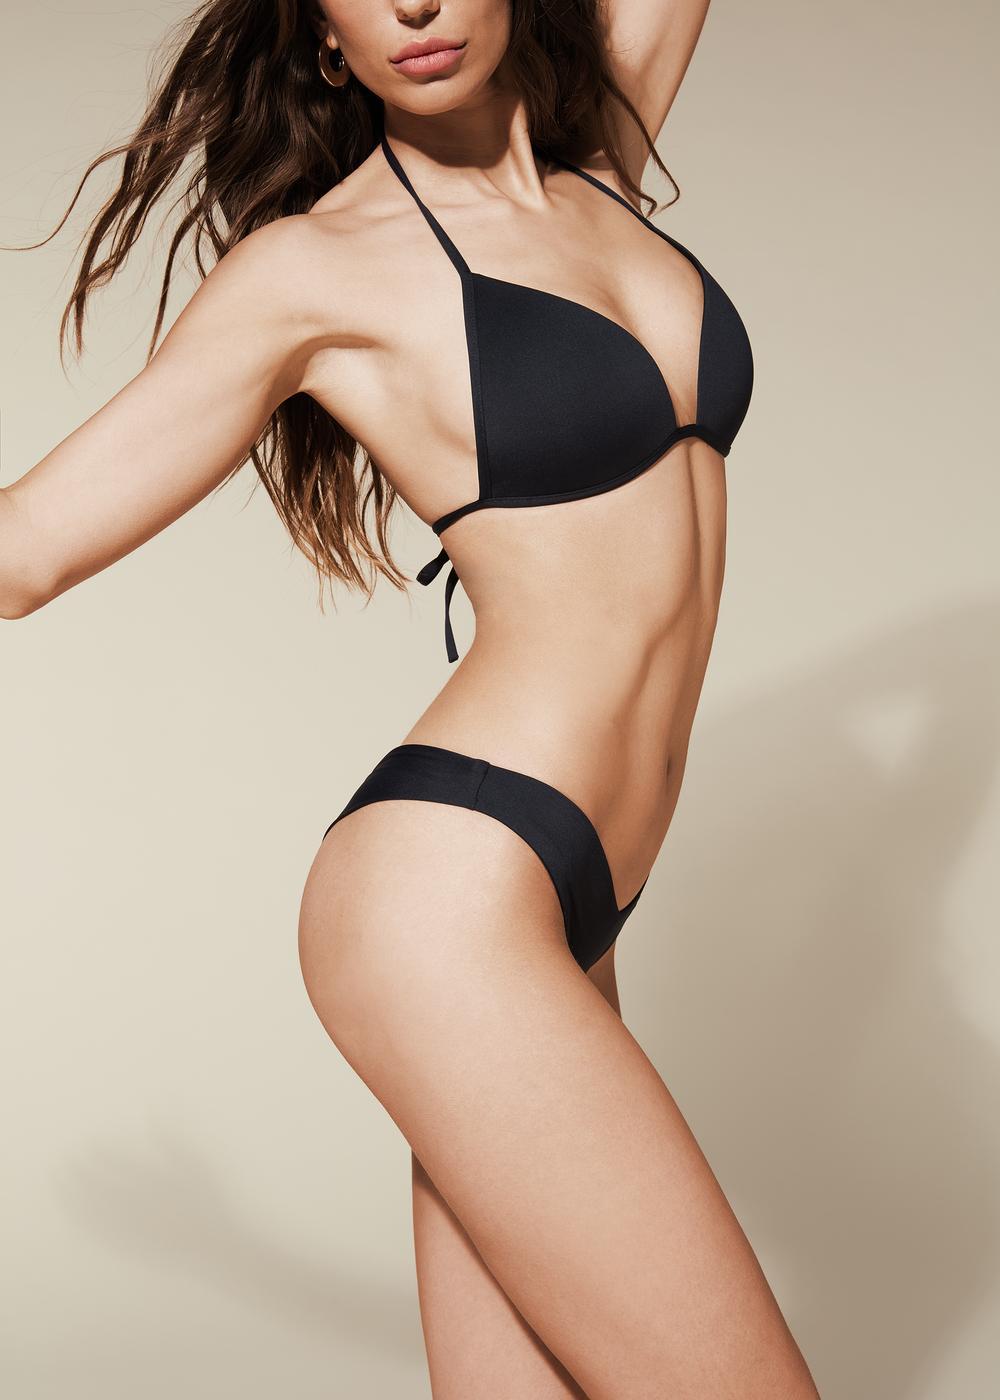 Braguitas de bikini brasileñas de pernera alta Indonesia